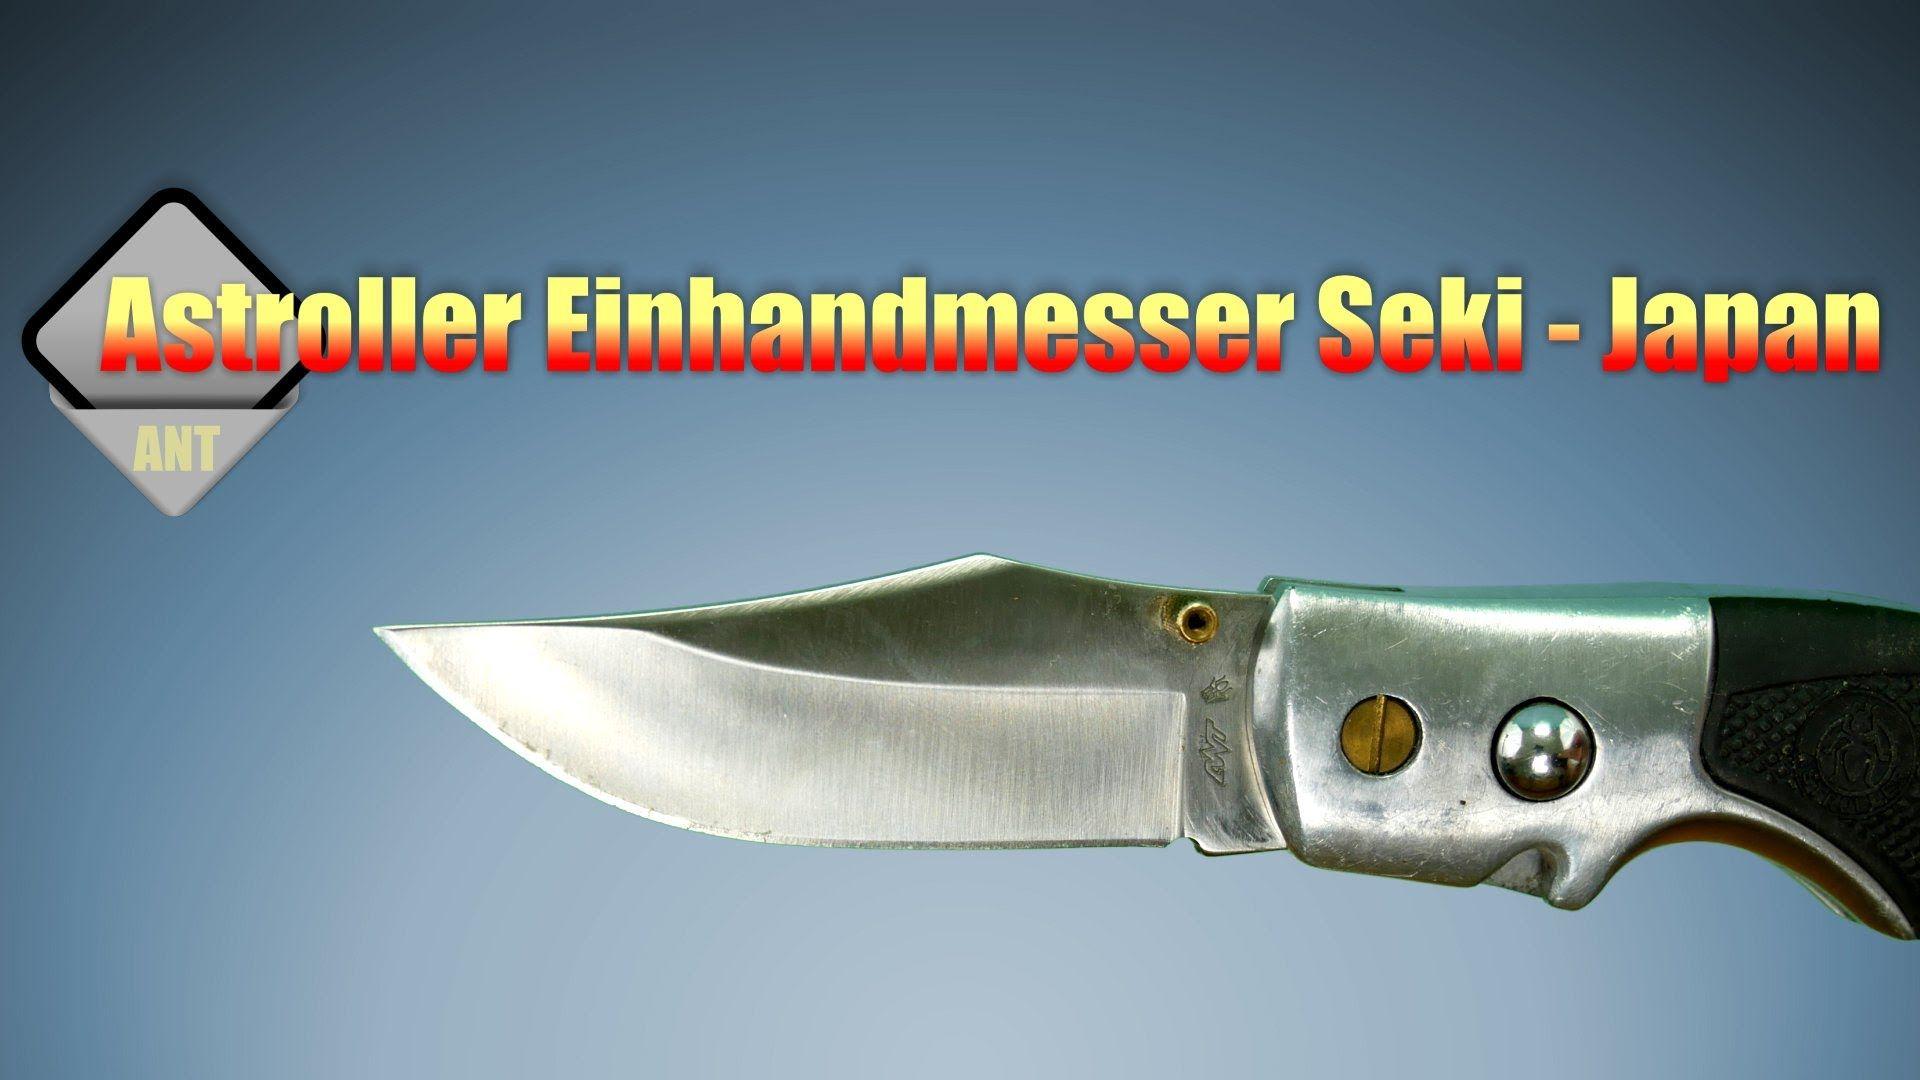 Ant Astroller Einhandmesser Seki Japan Klinge 7,5 cm, Griff ca. 10,5 ...